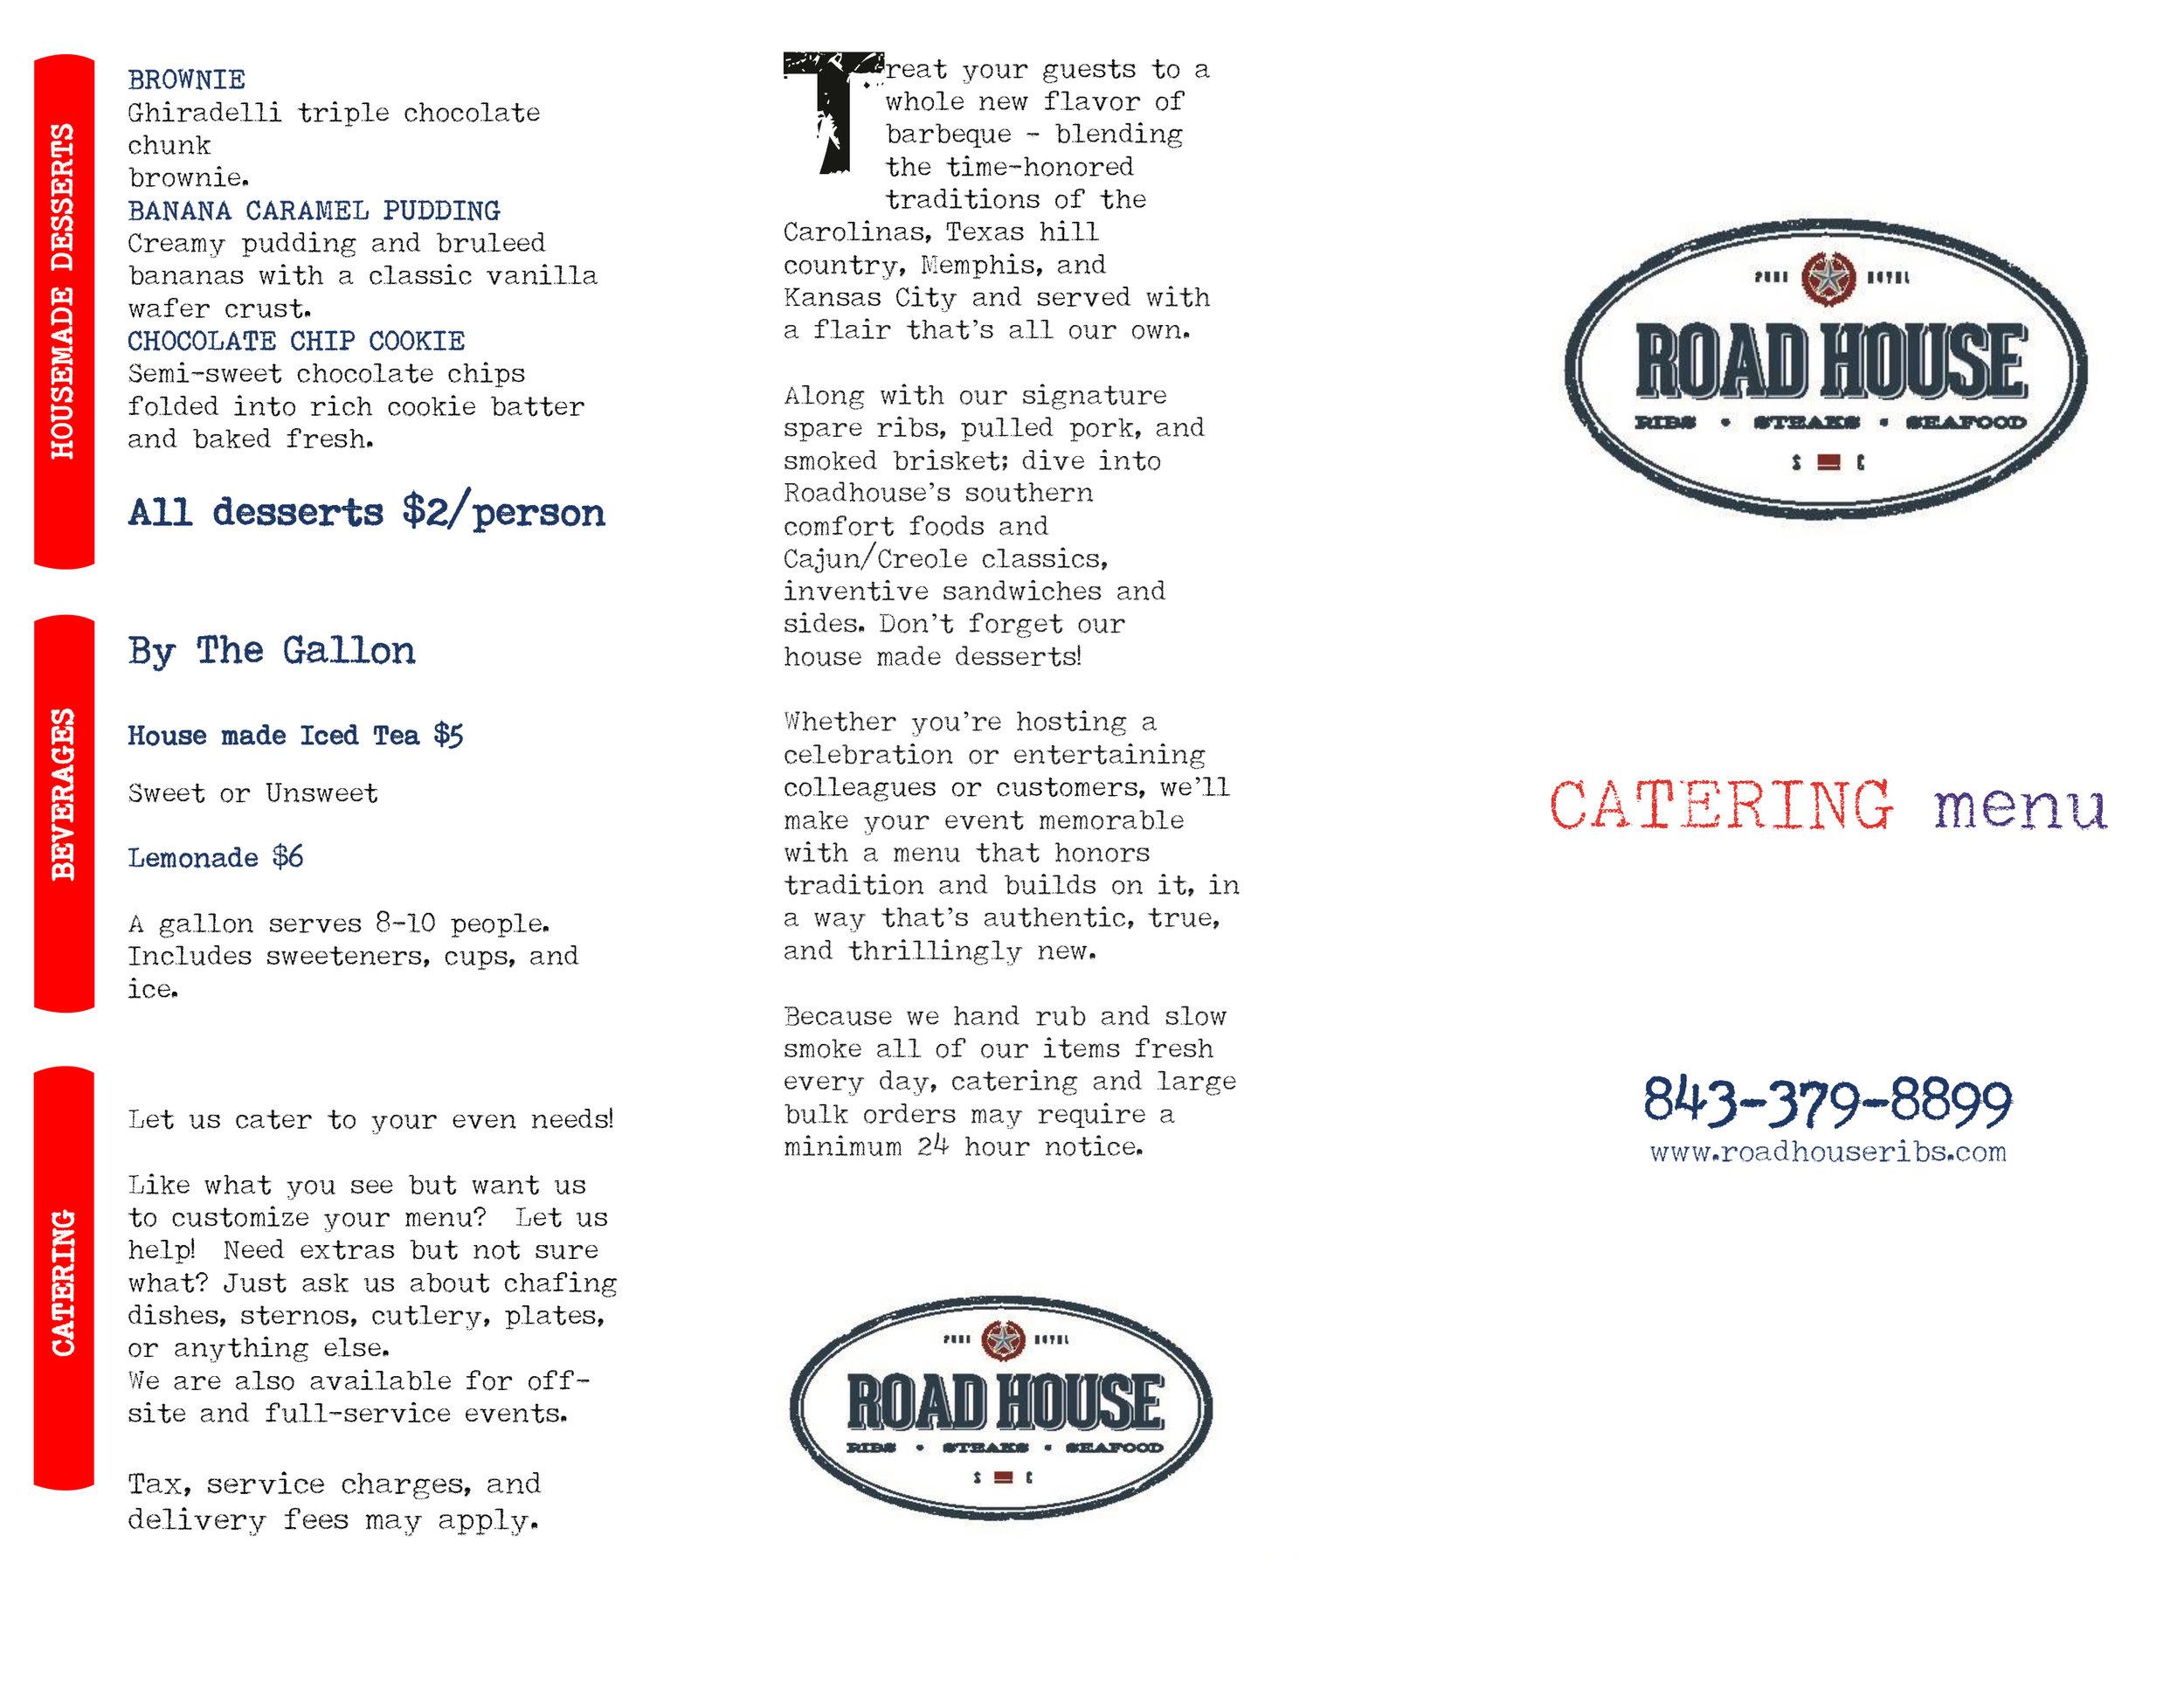 Roadhouse Catering Menu v10-1.jpg